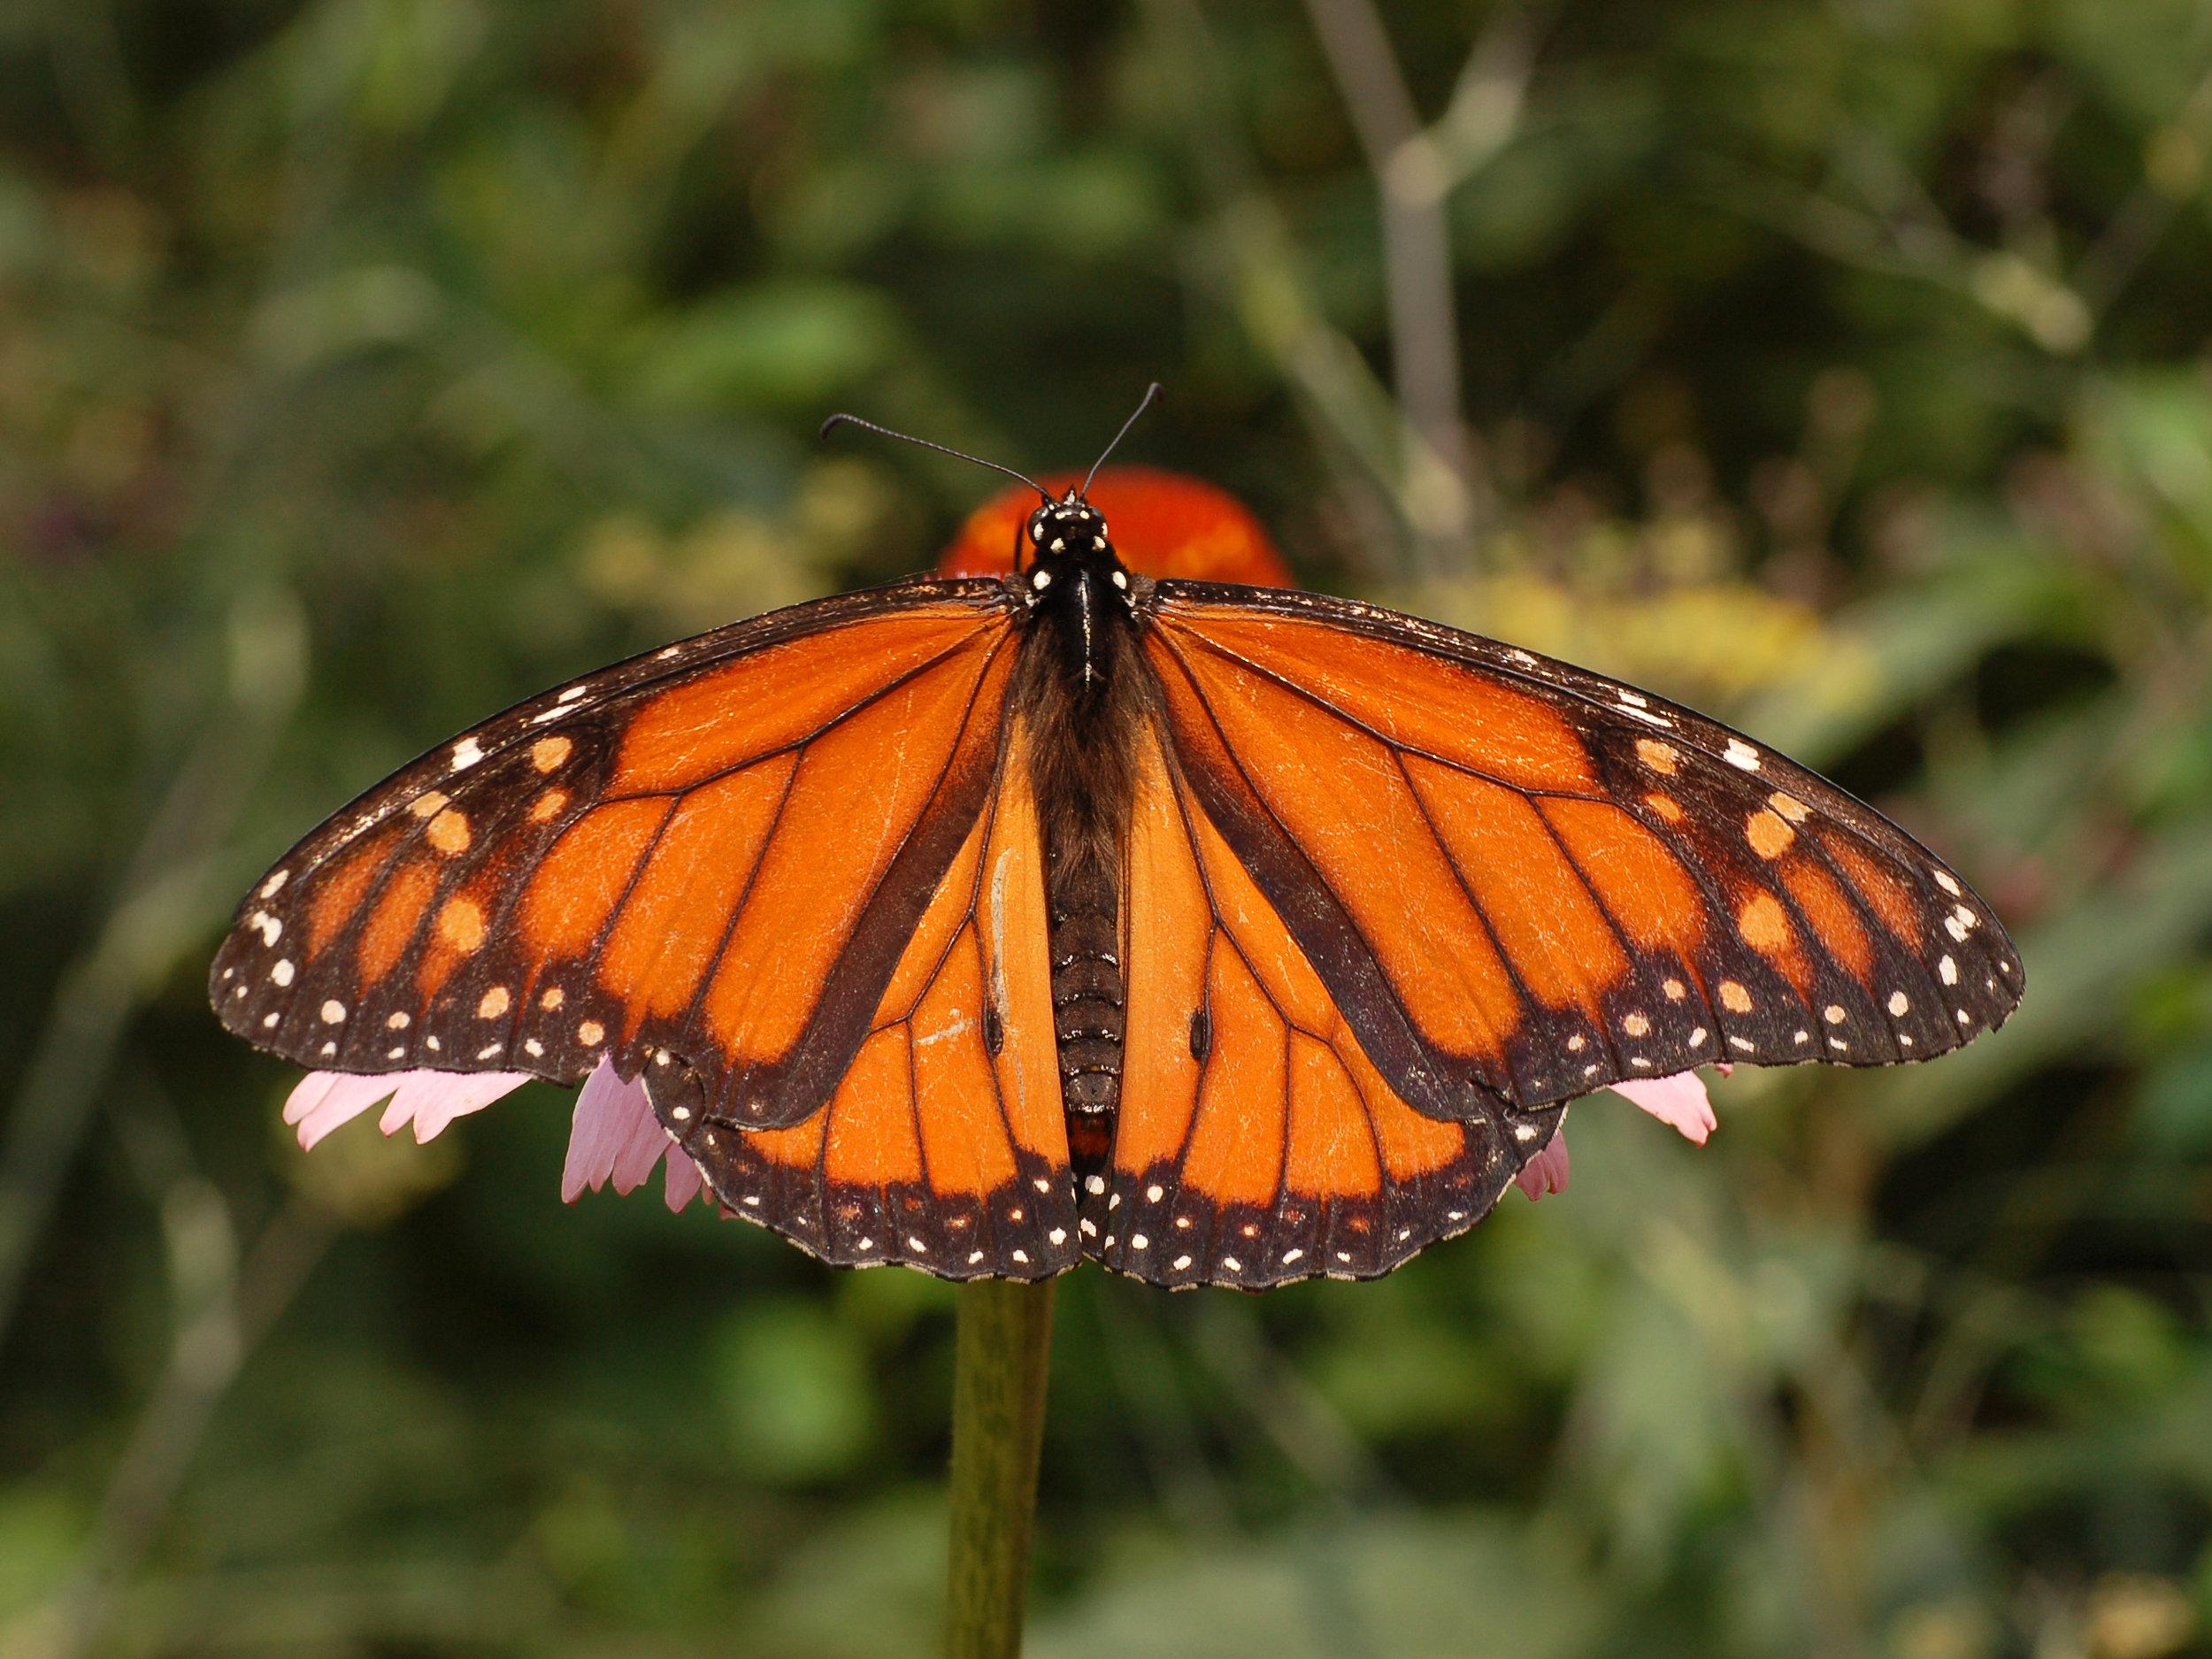 Monarch_Butterfly_Danaus_plexippus_Male_2664px.jpg